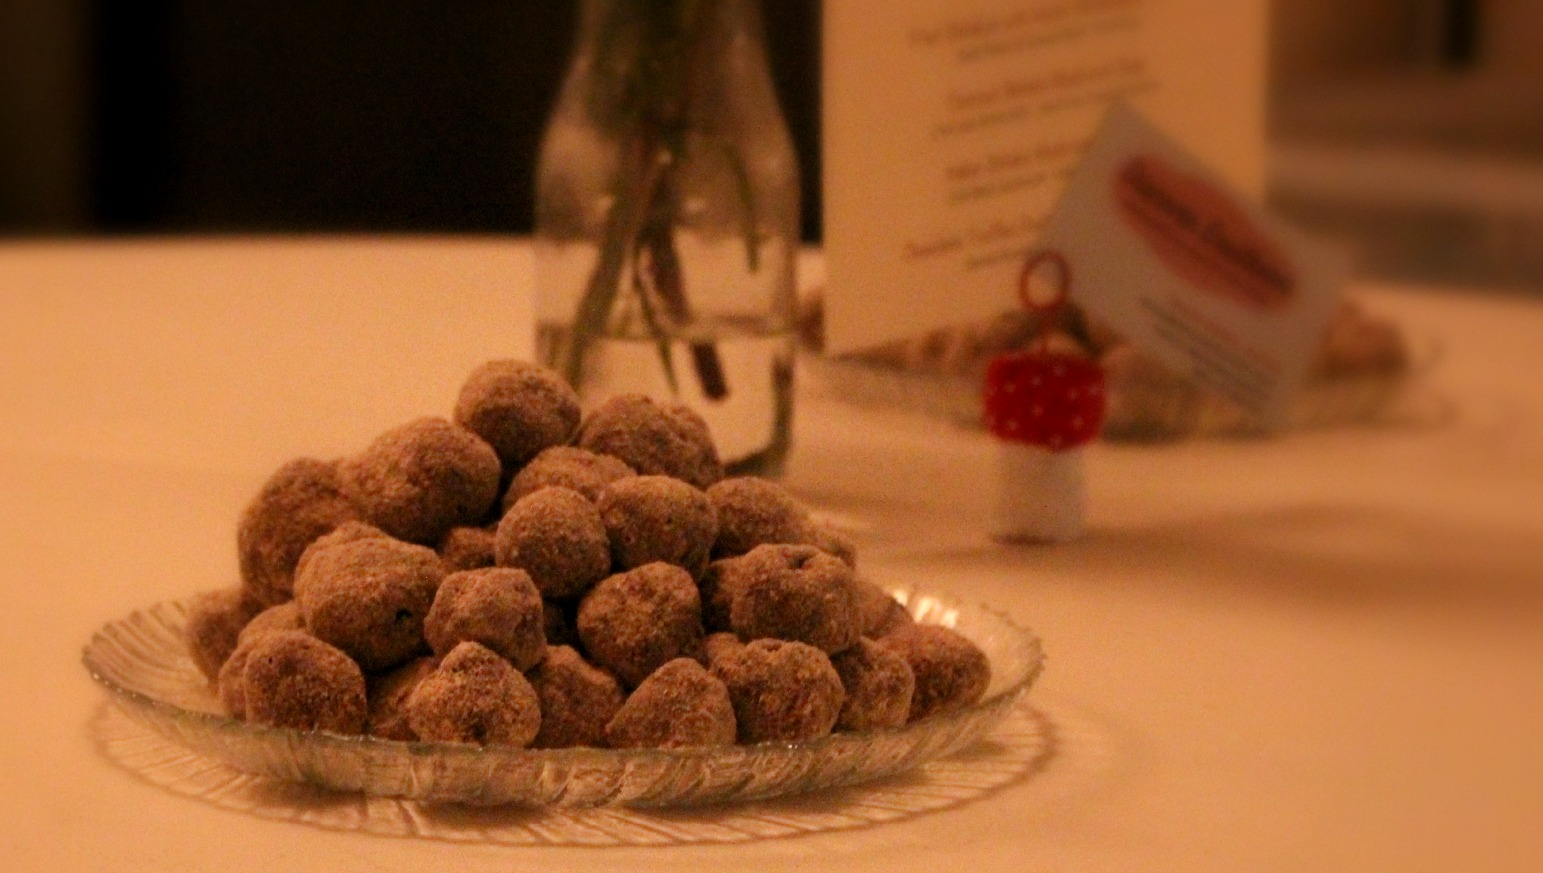 truffles on plate